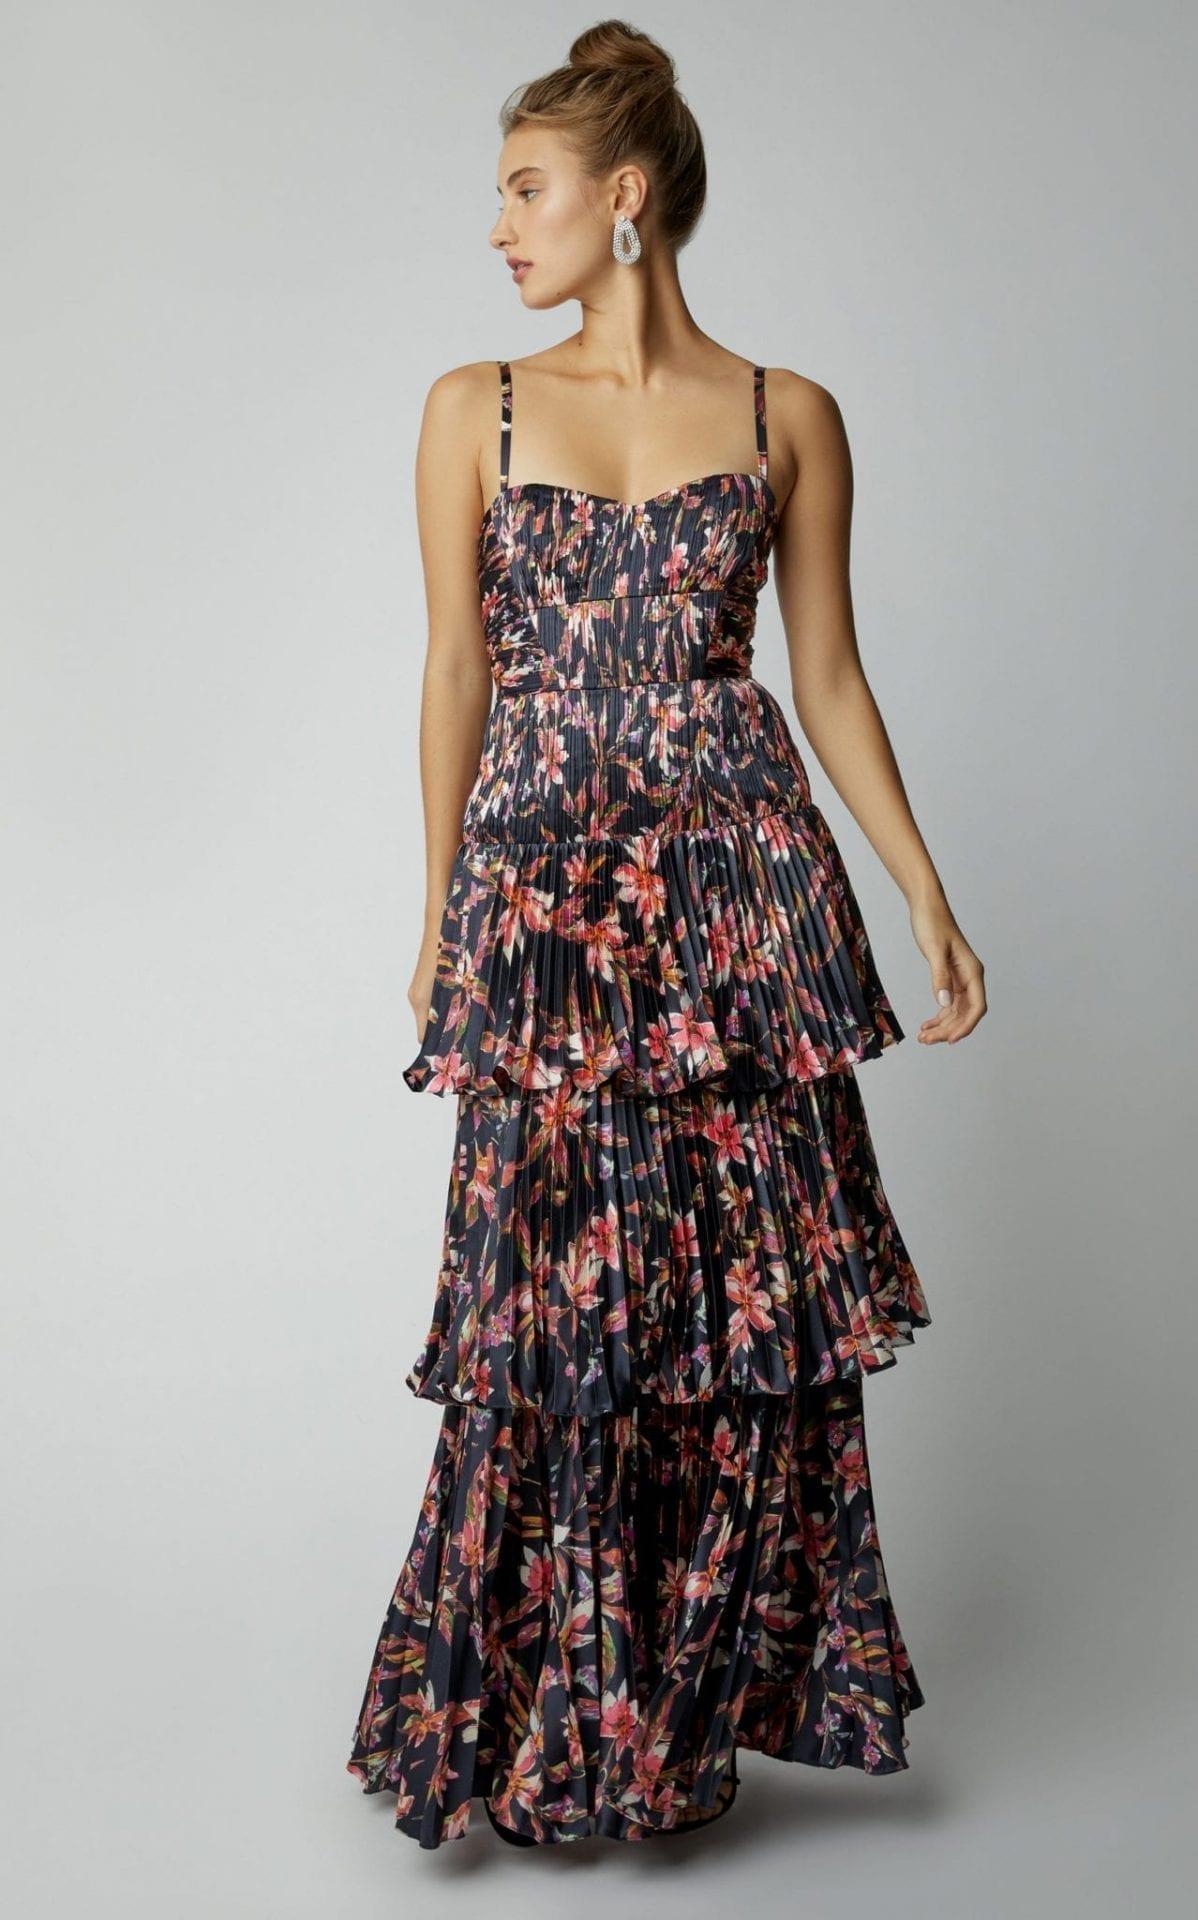 AMUR Londyn Printed Satin Maxi Black / Floral Printed Gown